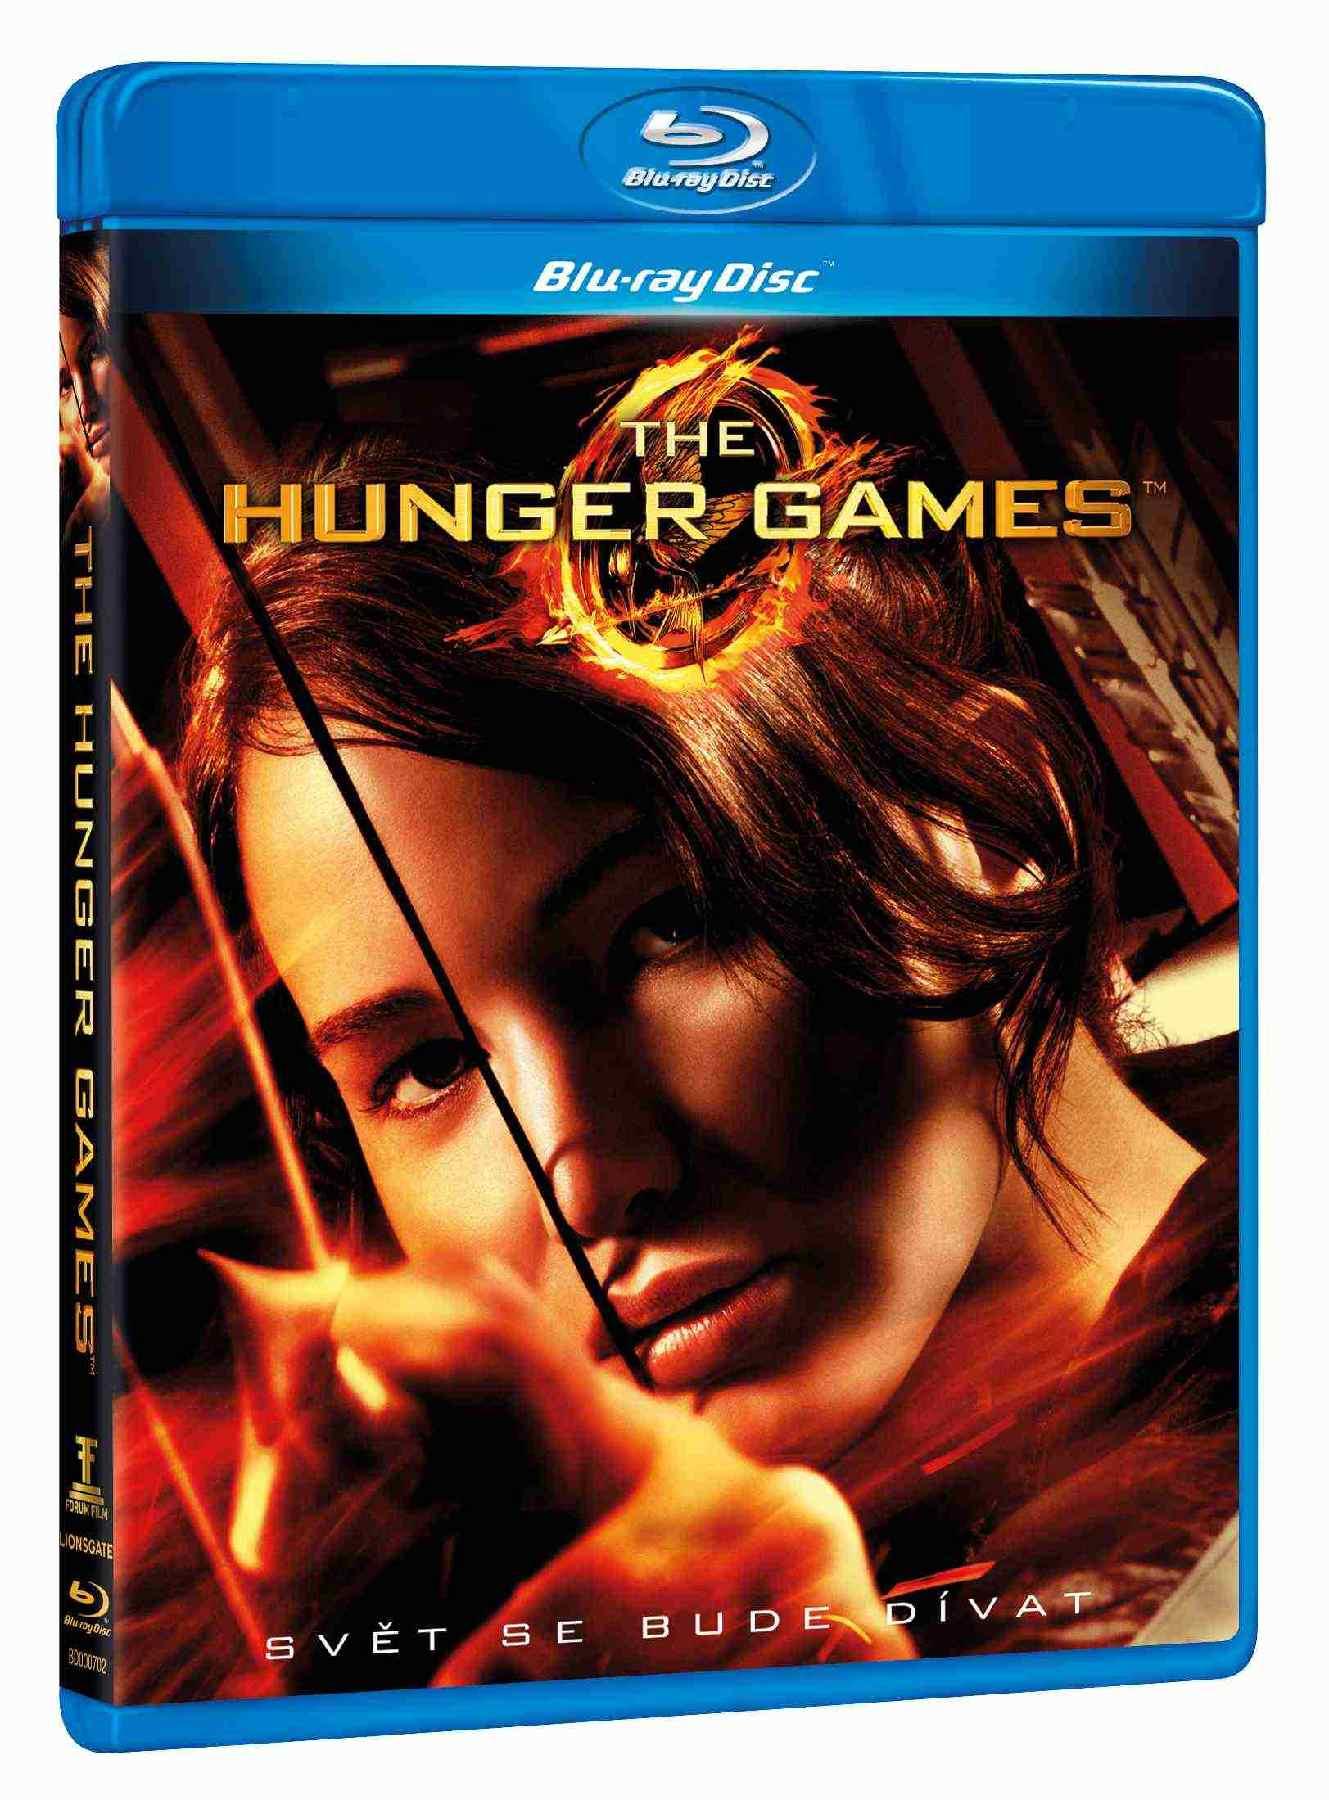 Hunger Games - Blu-ray